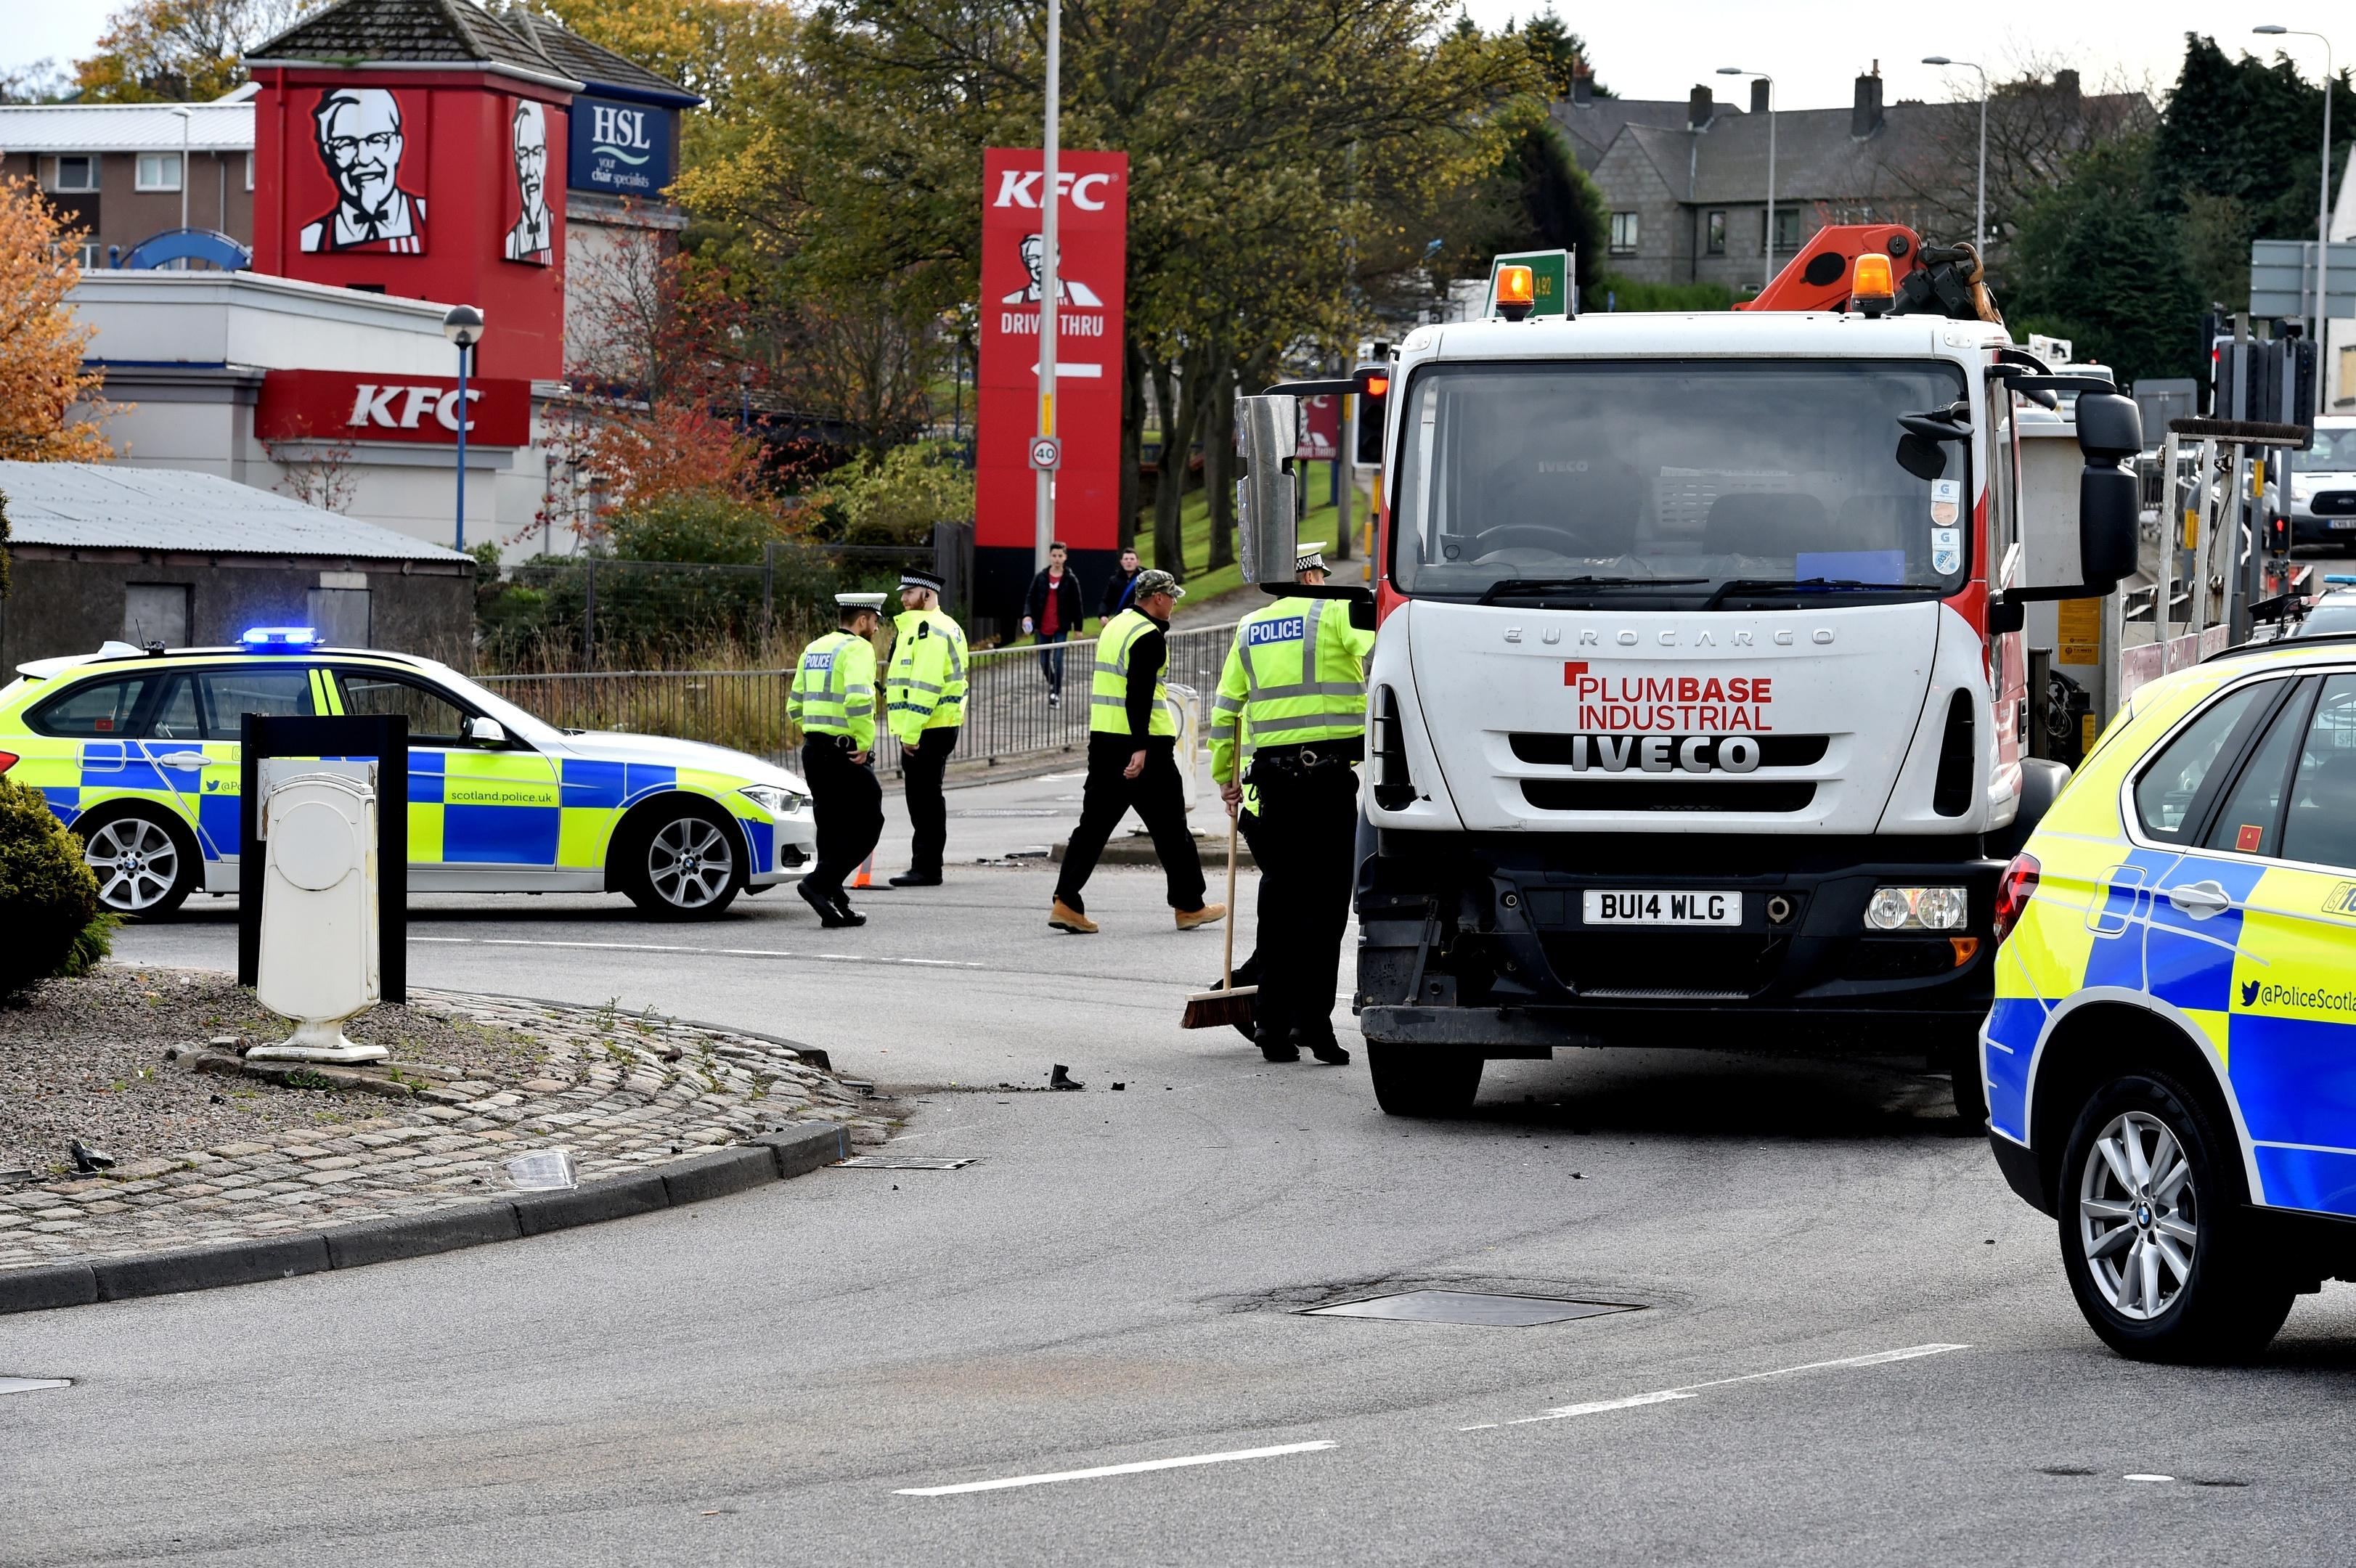 The crash scene at the Haudagain roundabout